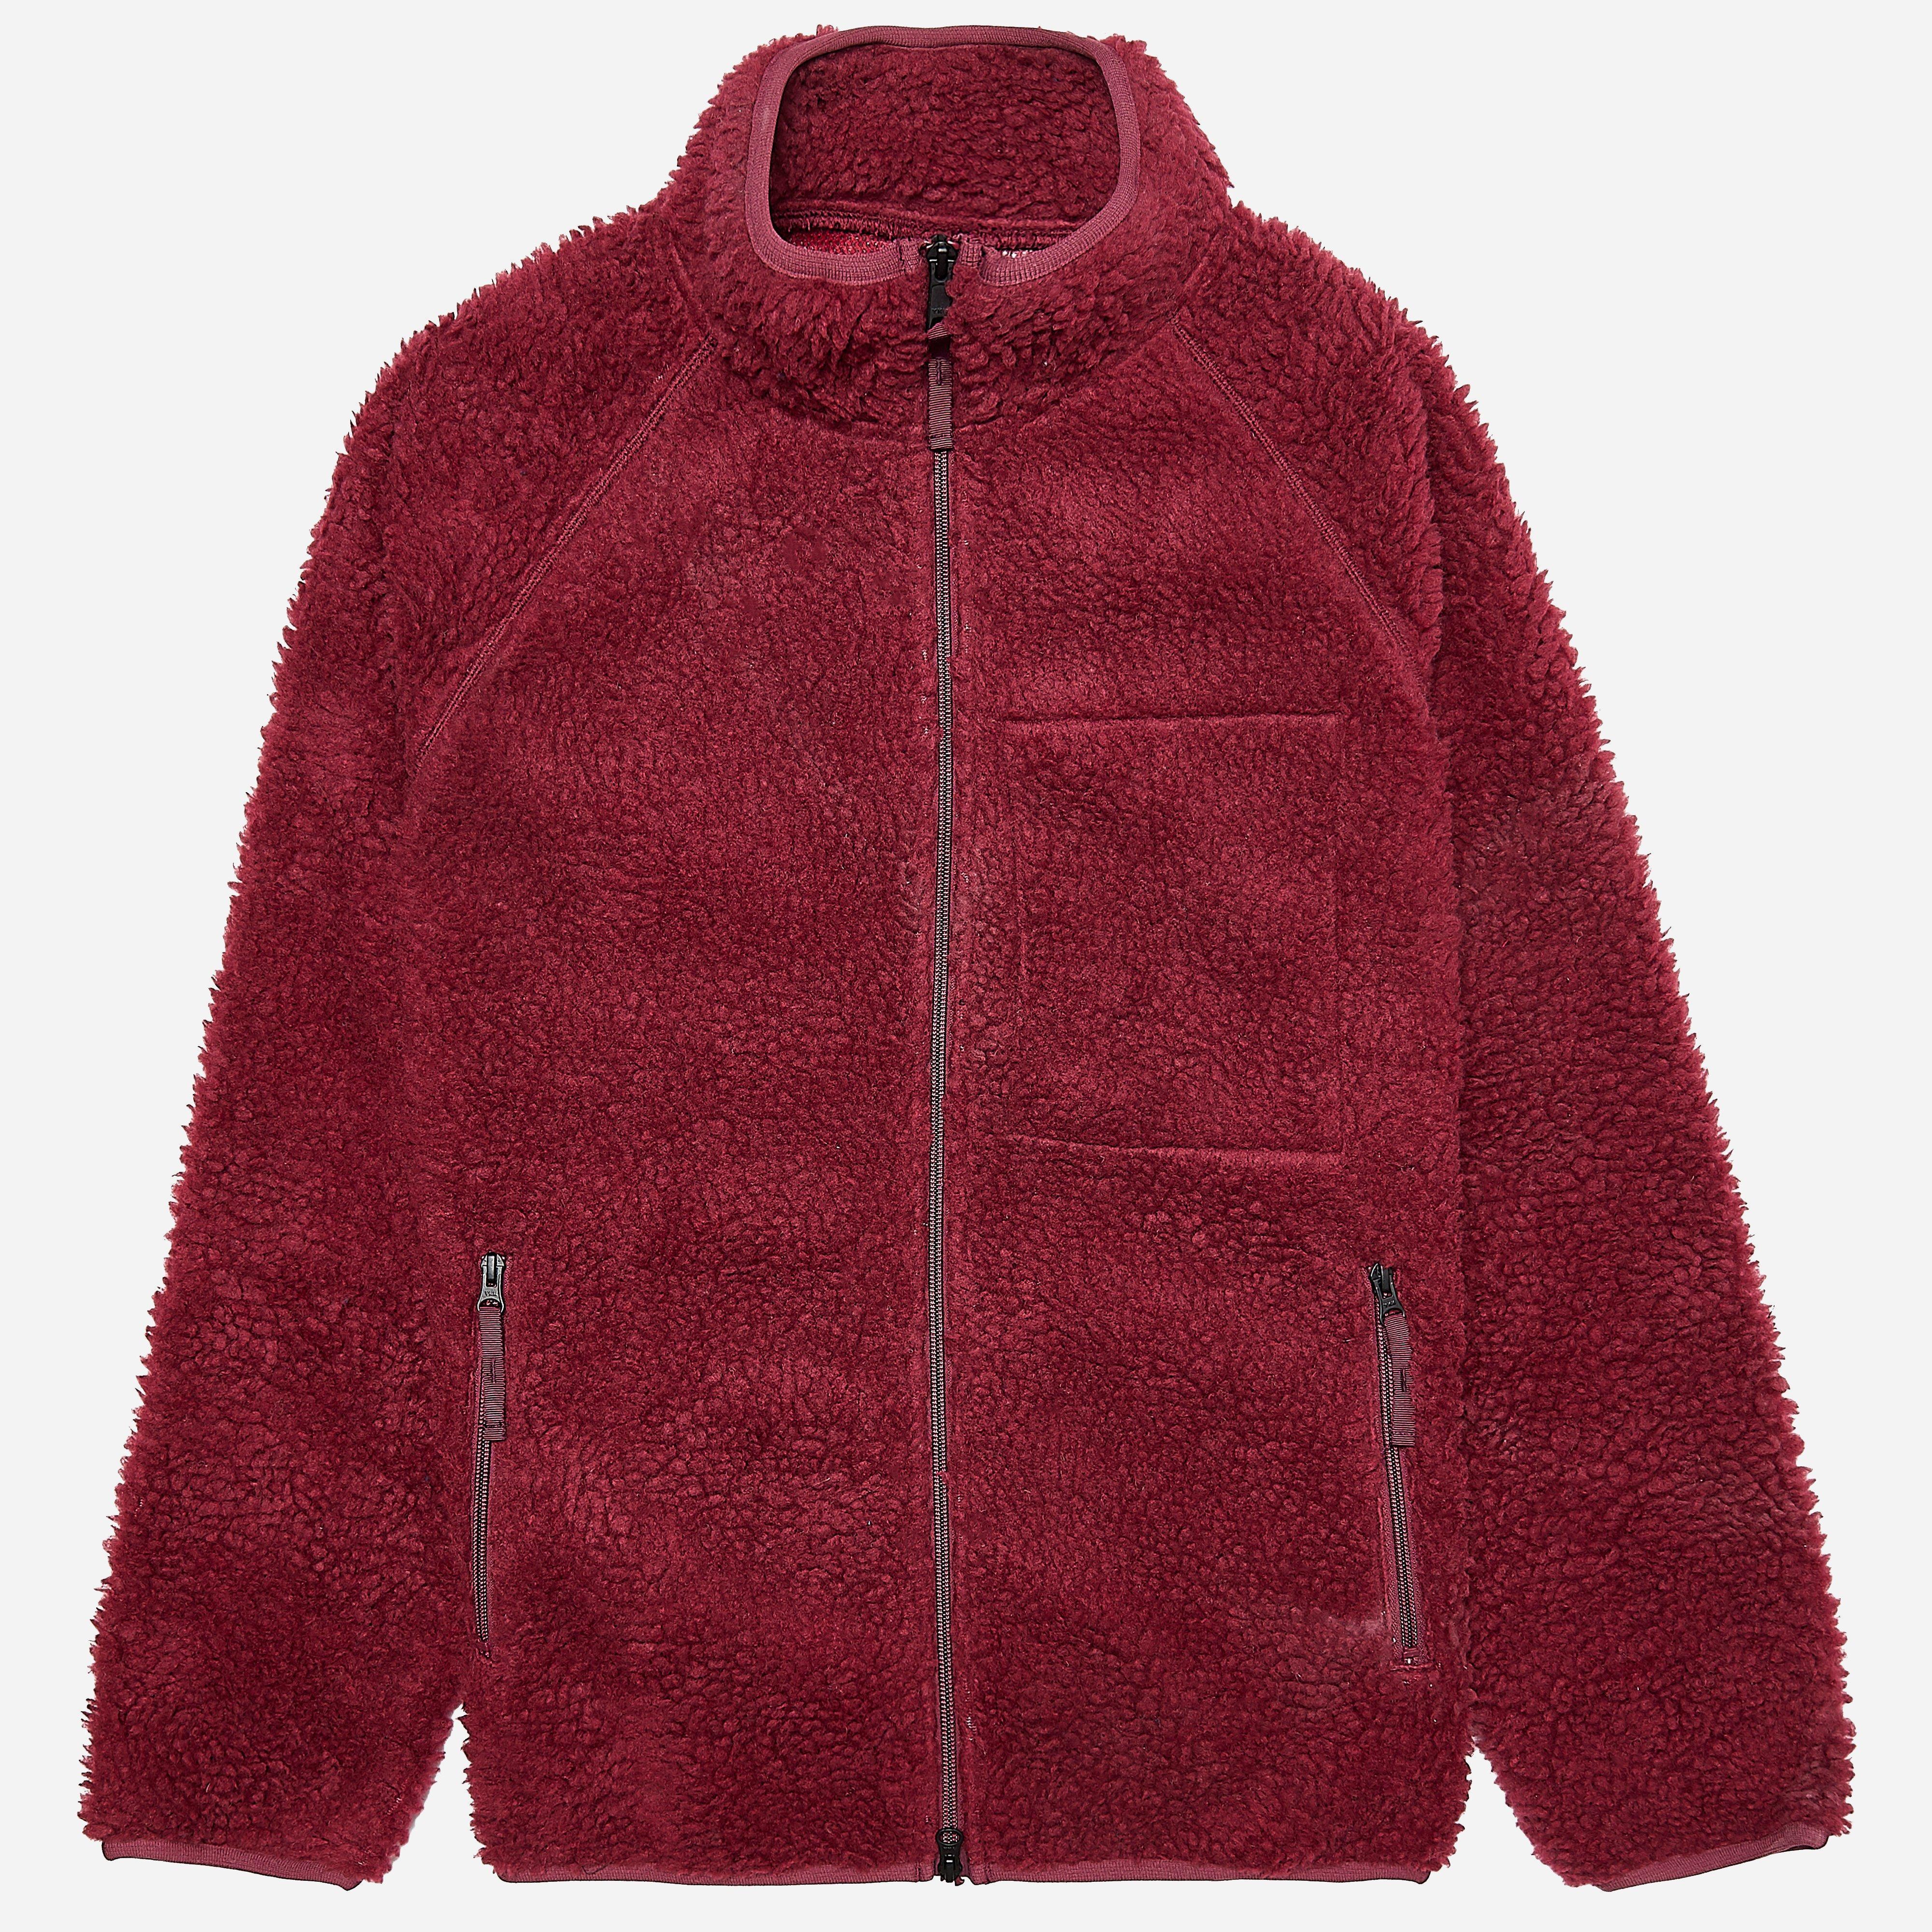 166cc06ff Lyst - Manastash Mt Gorilla Ii Jacket in Red for Men